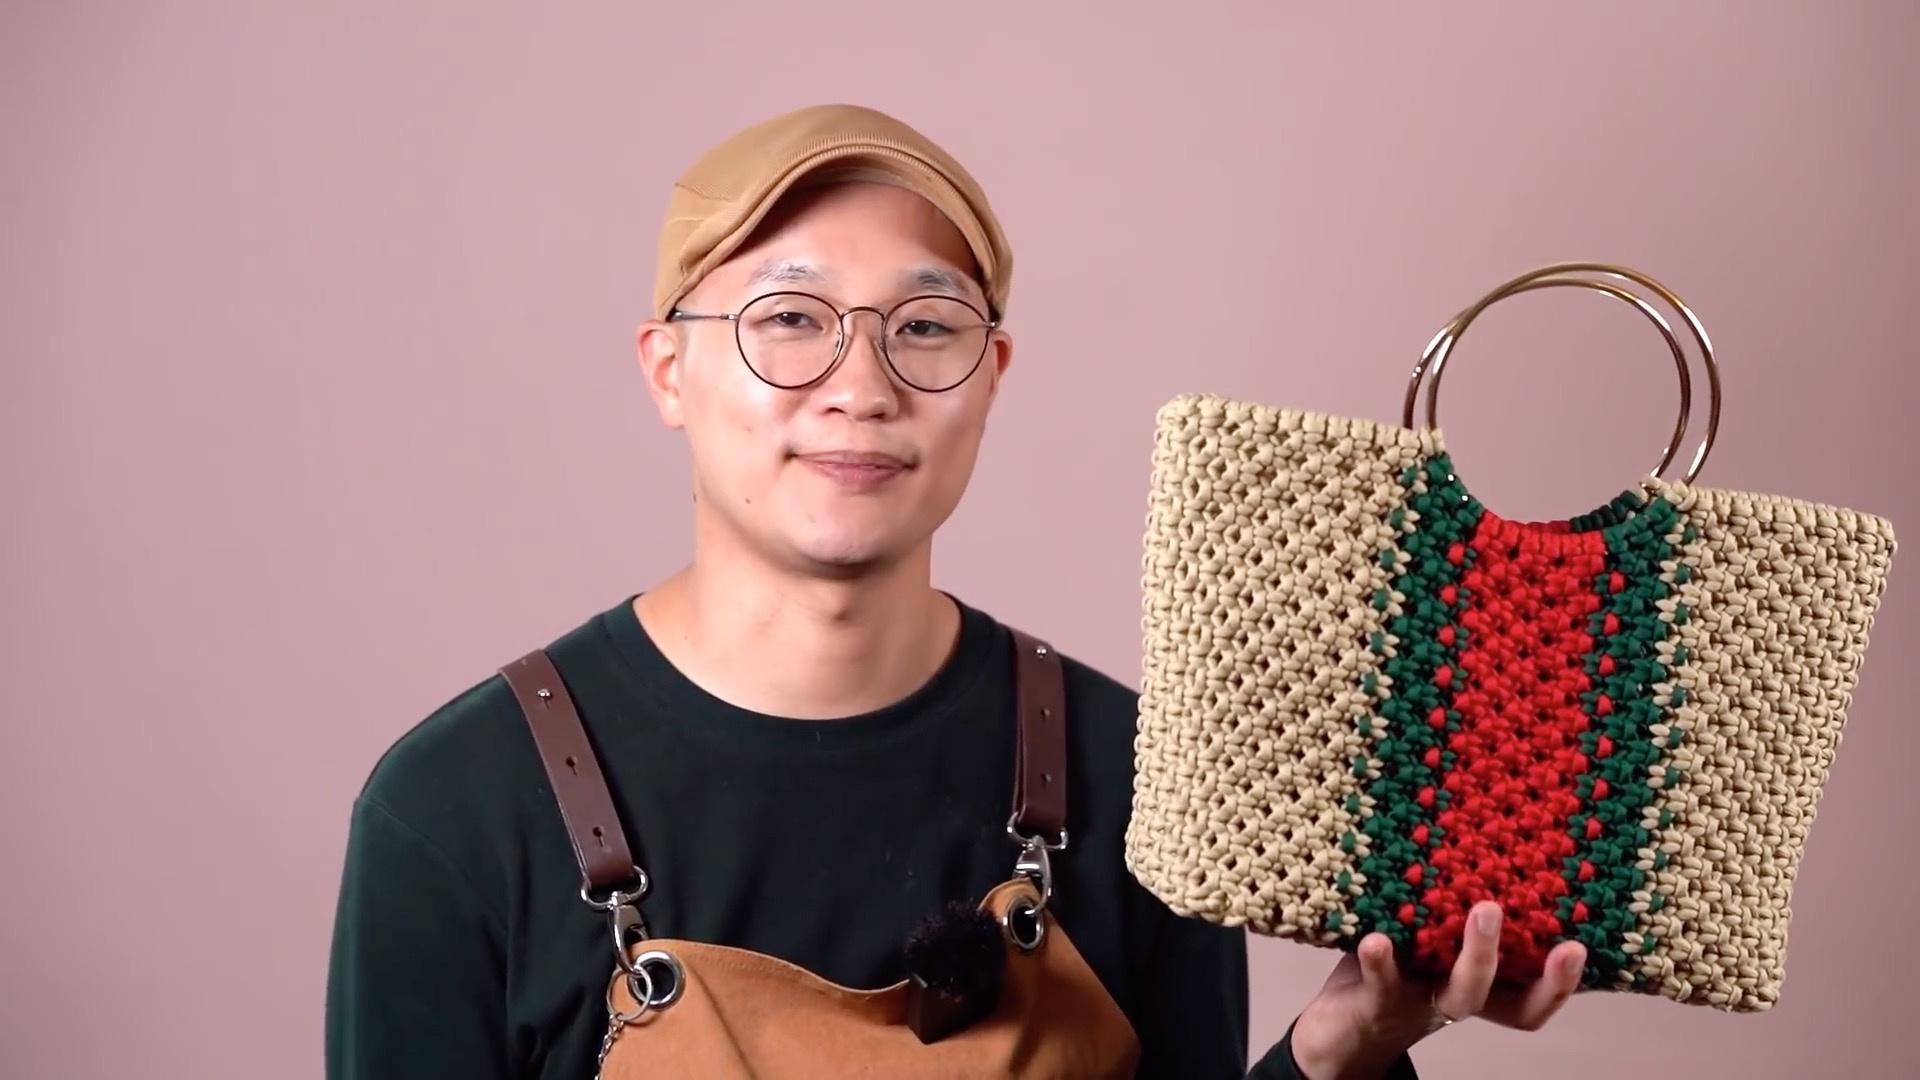 DIY手工编织挽手编织包(DIY Macrame Bag)